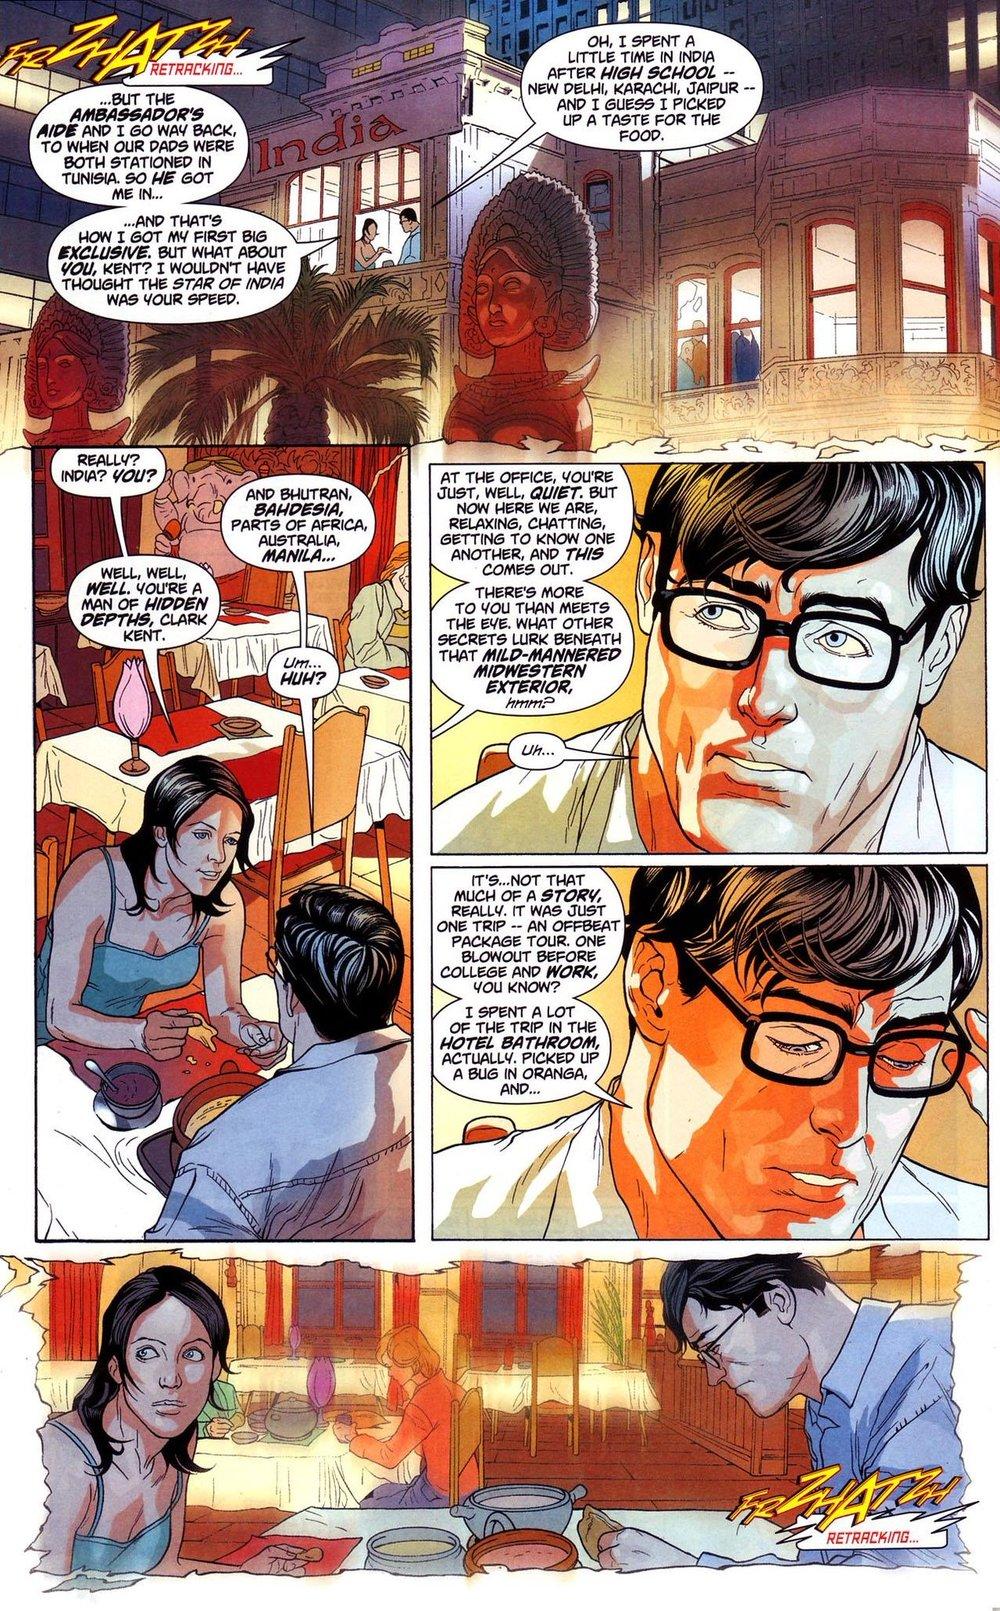 Action Comics #850